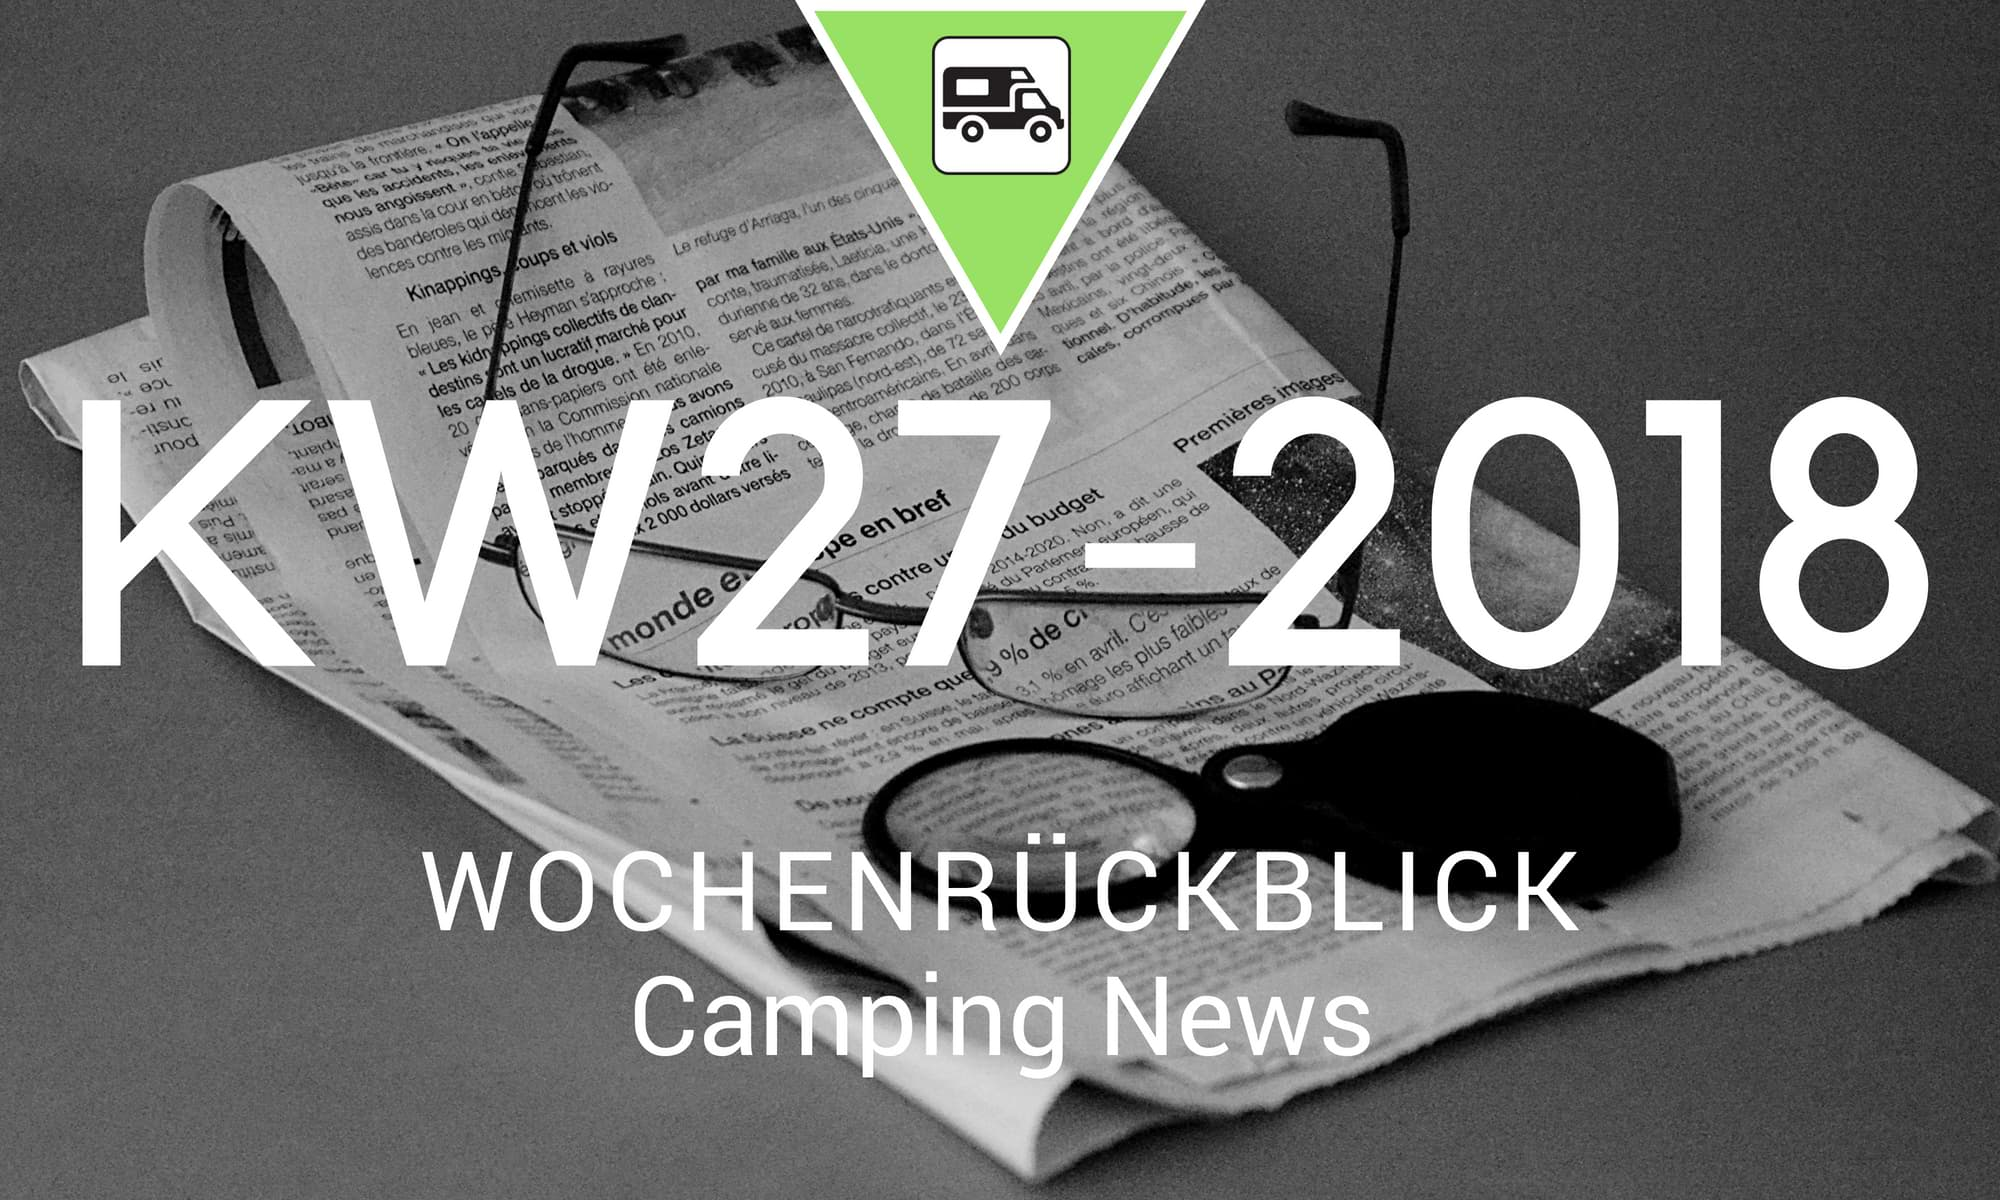 Wochenrückblick Camping News KW27-2018